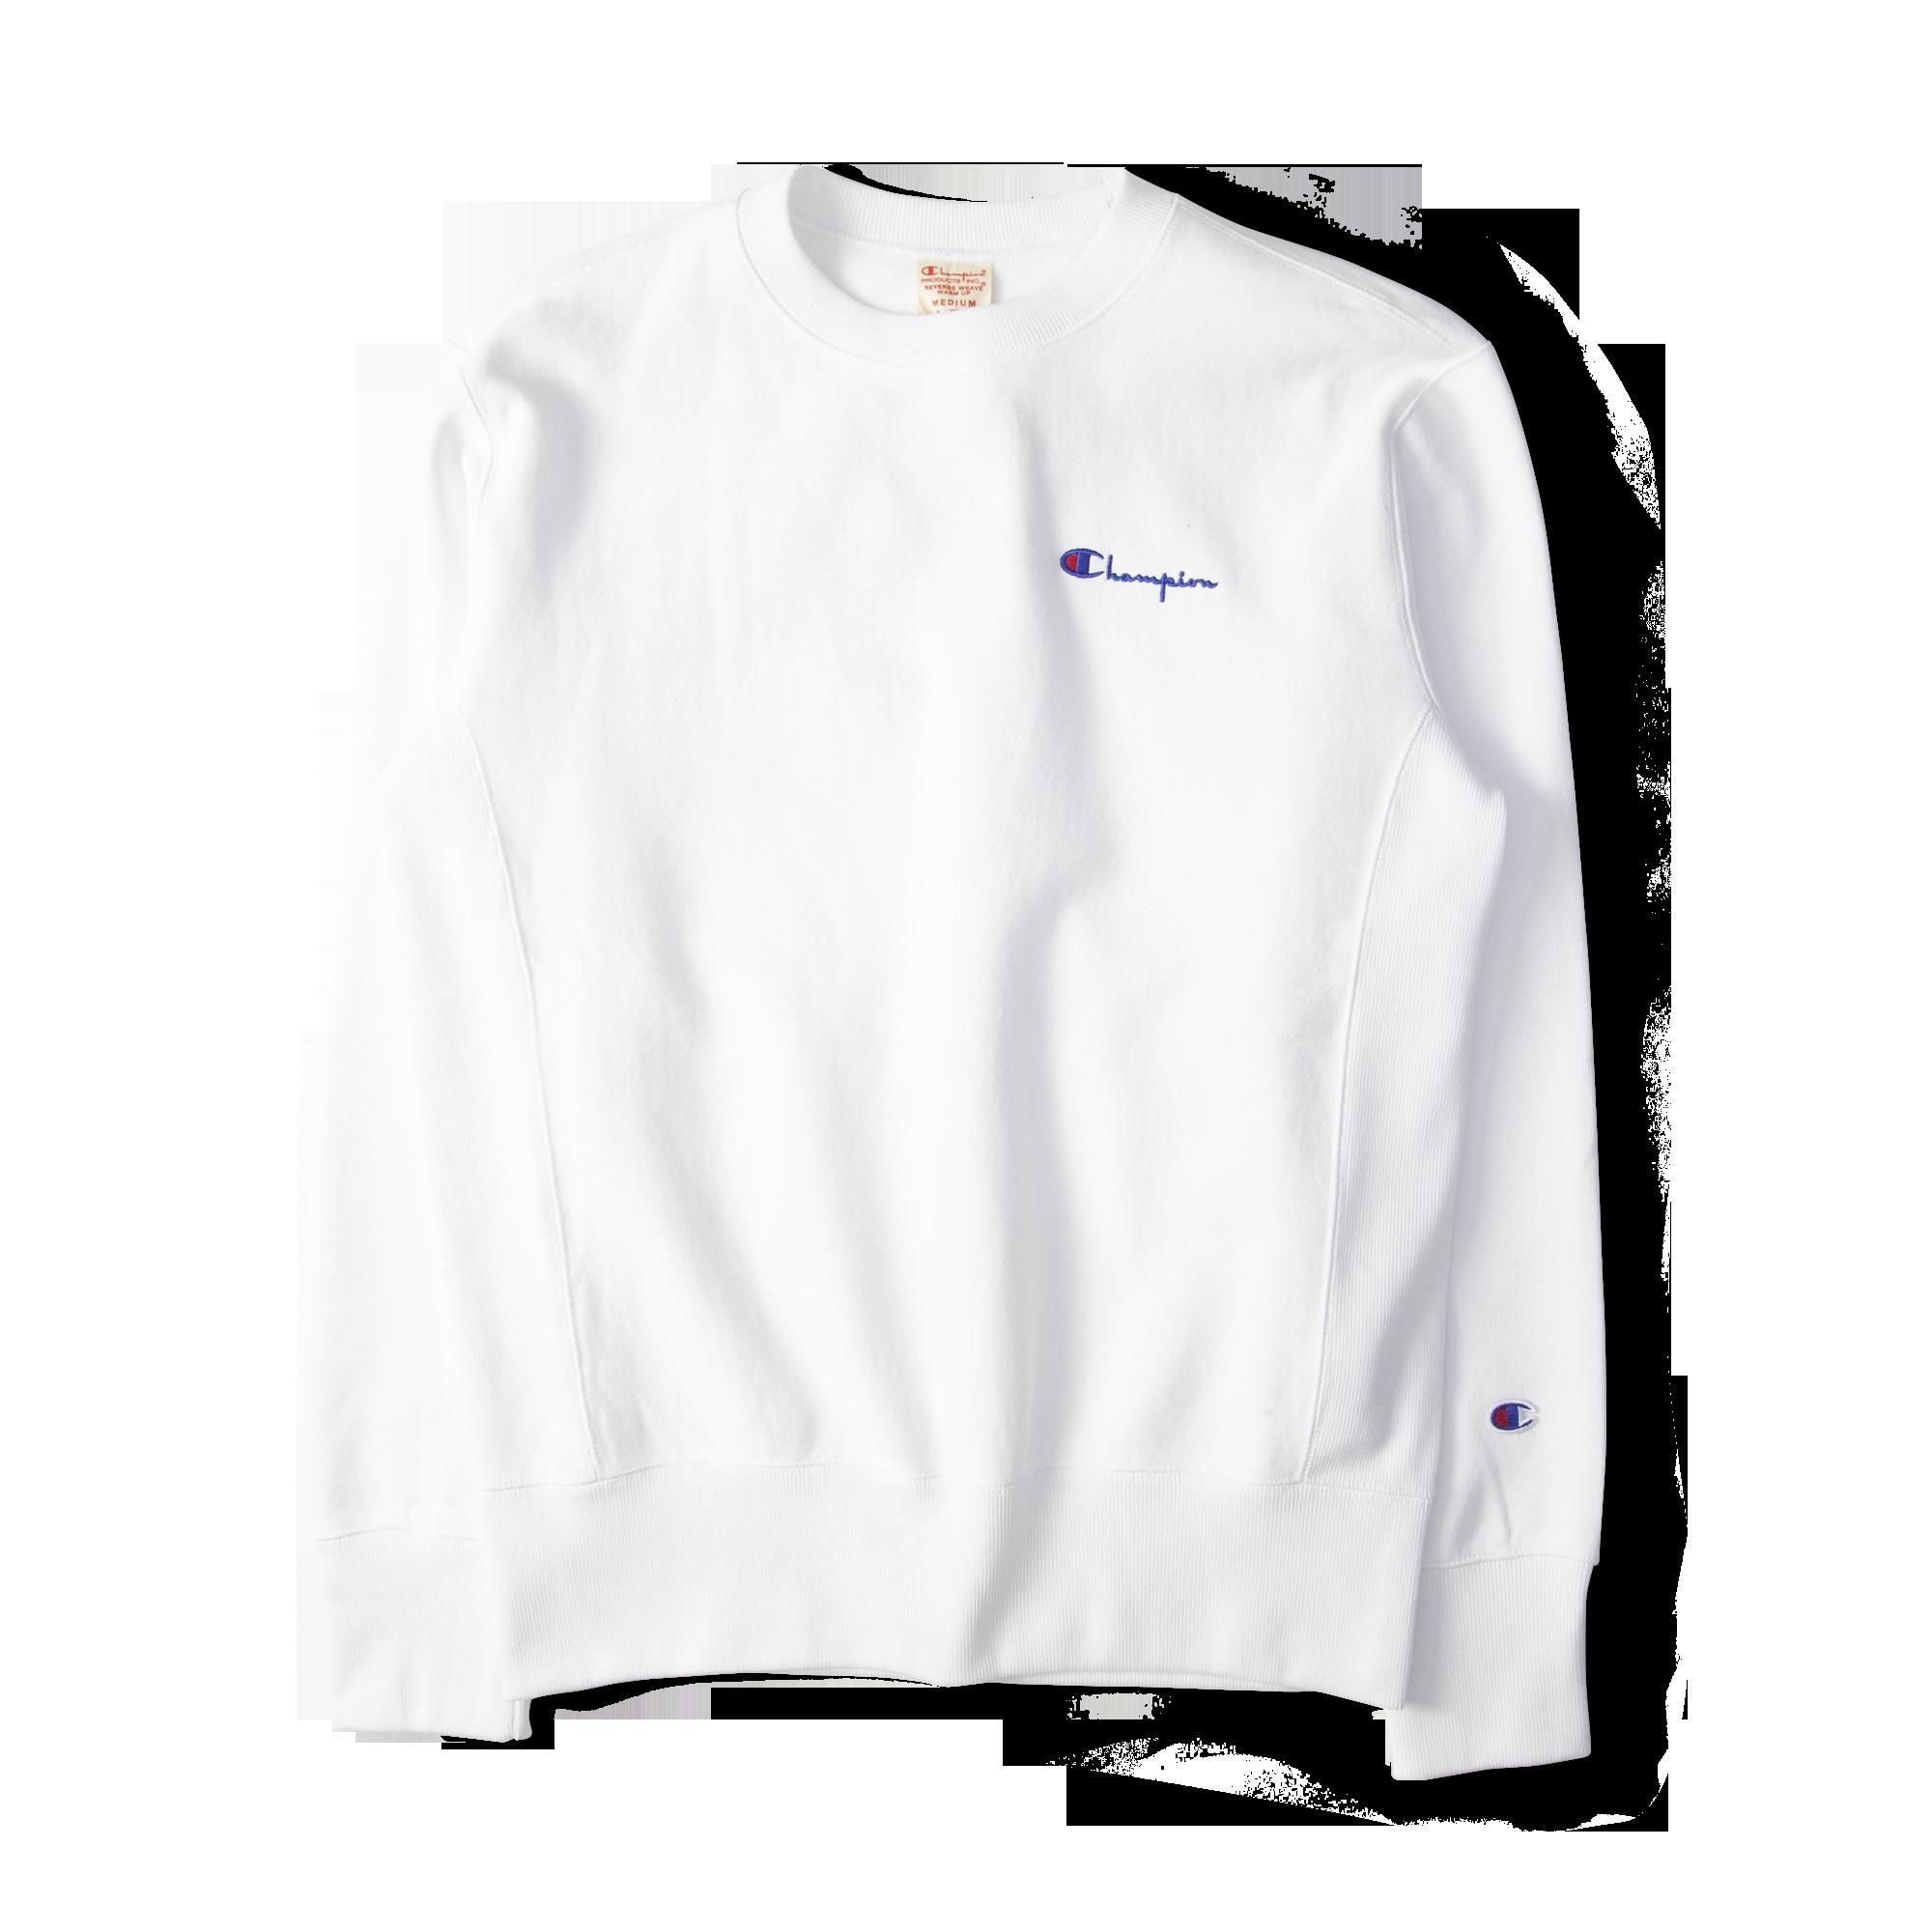 4915c8632f43 Champion Reverse Weave Rear Print Logo Crew Sweat White Free SHIPPING OVER  £50.00 #grants #grants1856 #1856